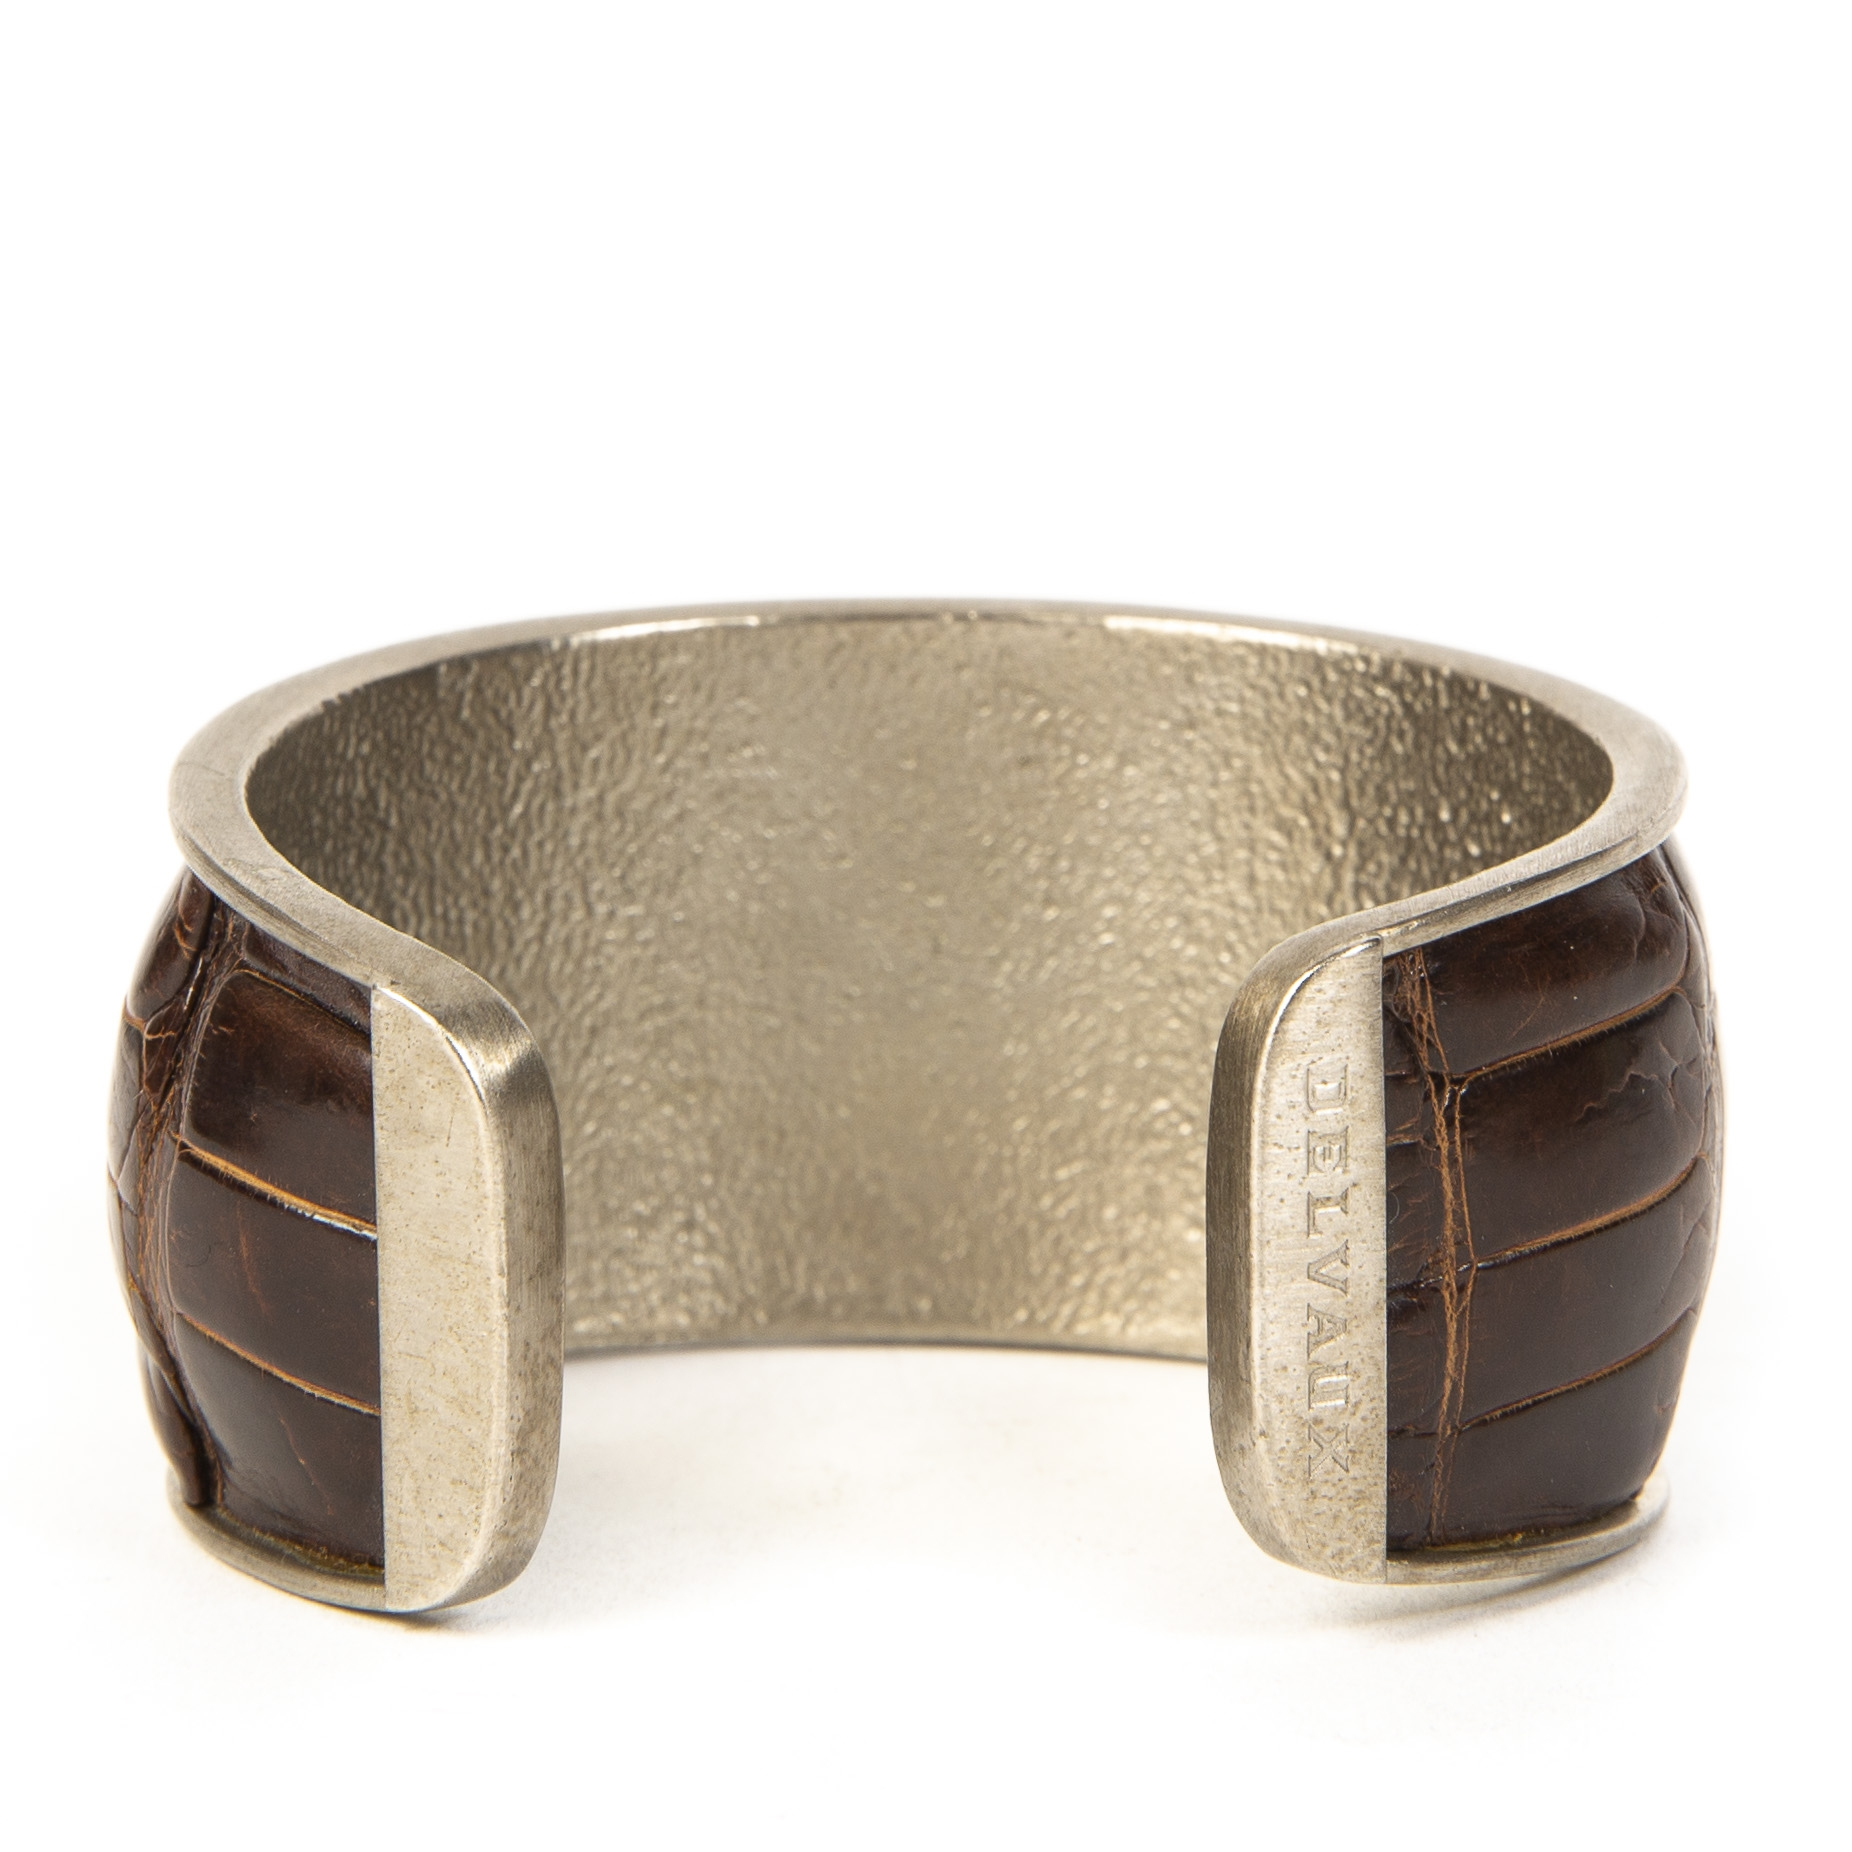 Delvaux Brown Croco Cuff Bracelet